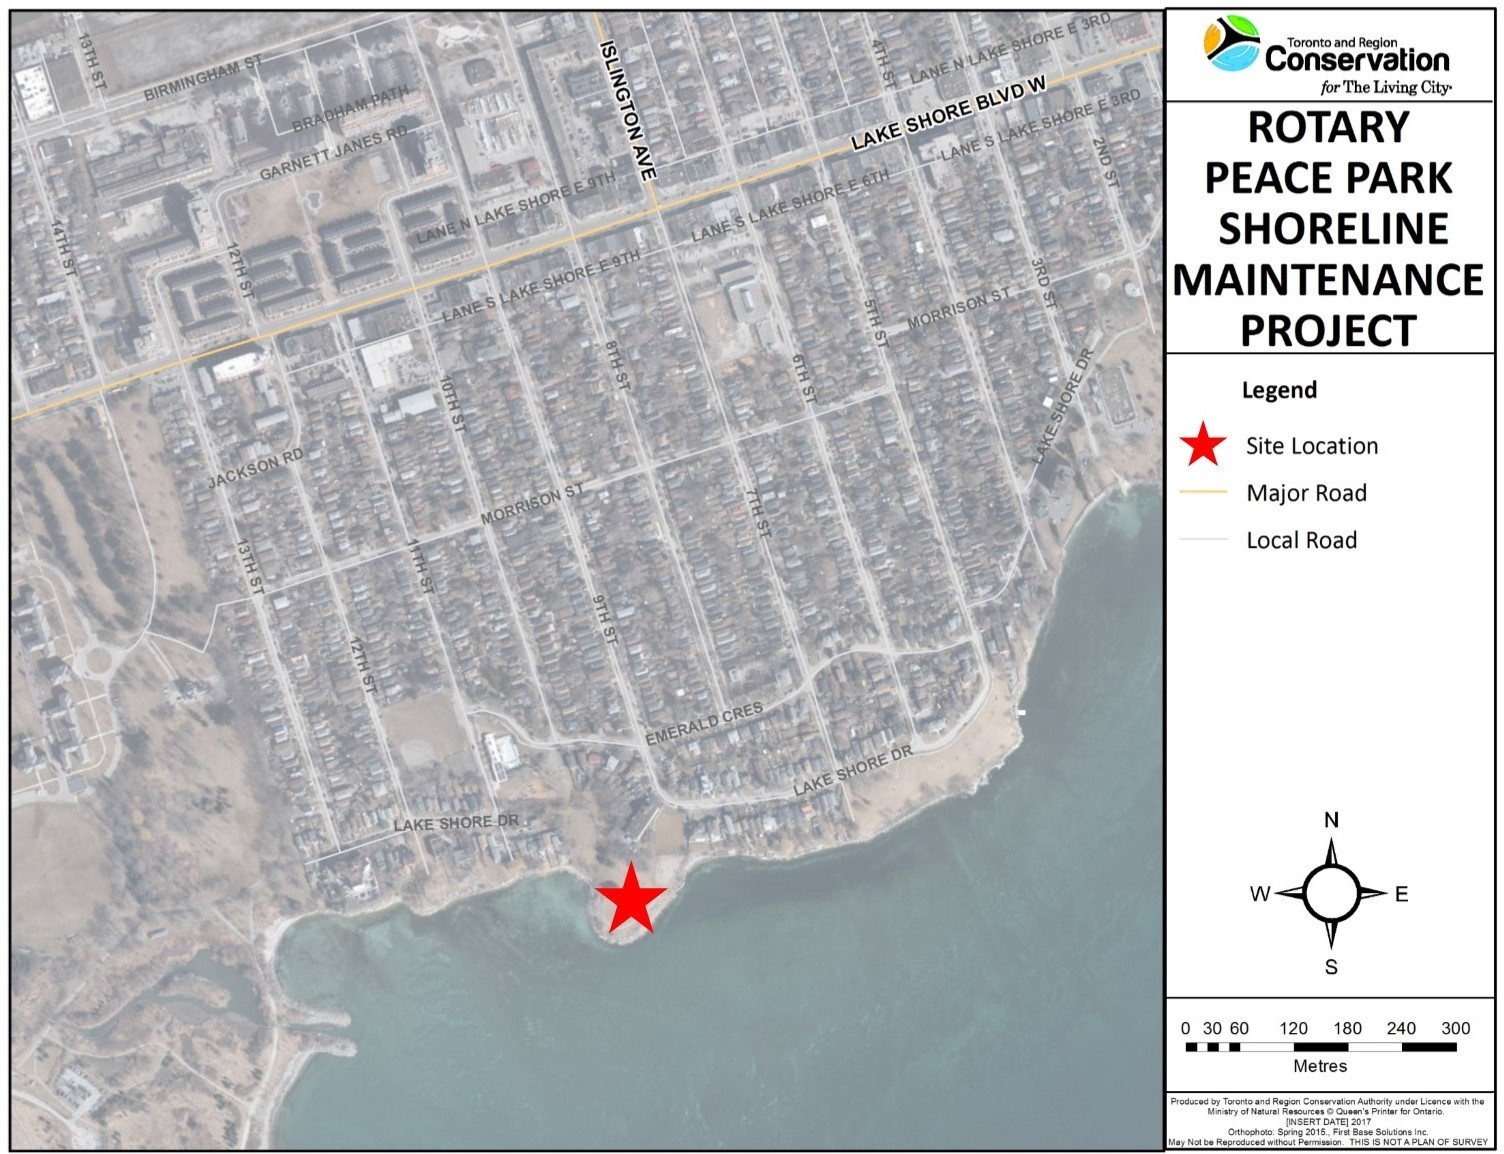 Location of Rotary Peace Park Shoreline Maintenance Project. Source: TRCA, 2018.